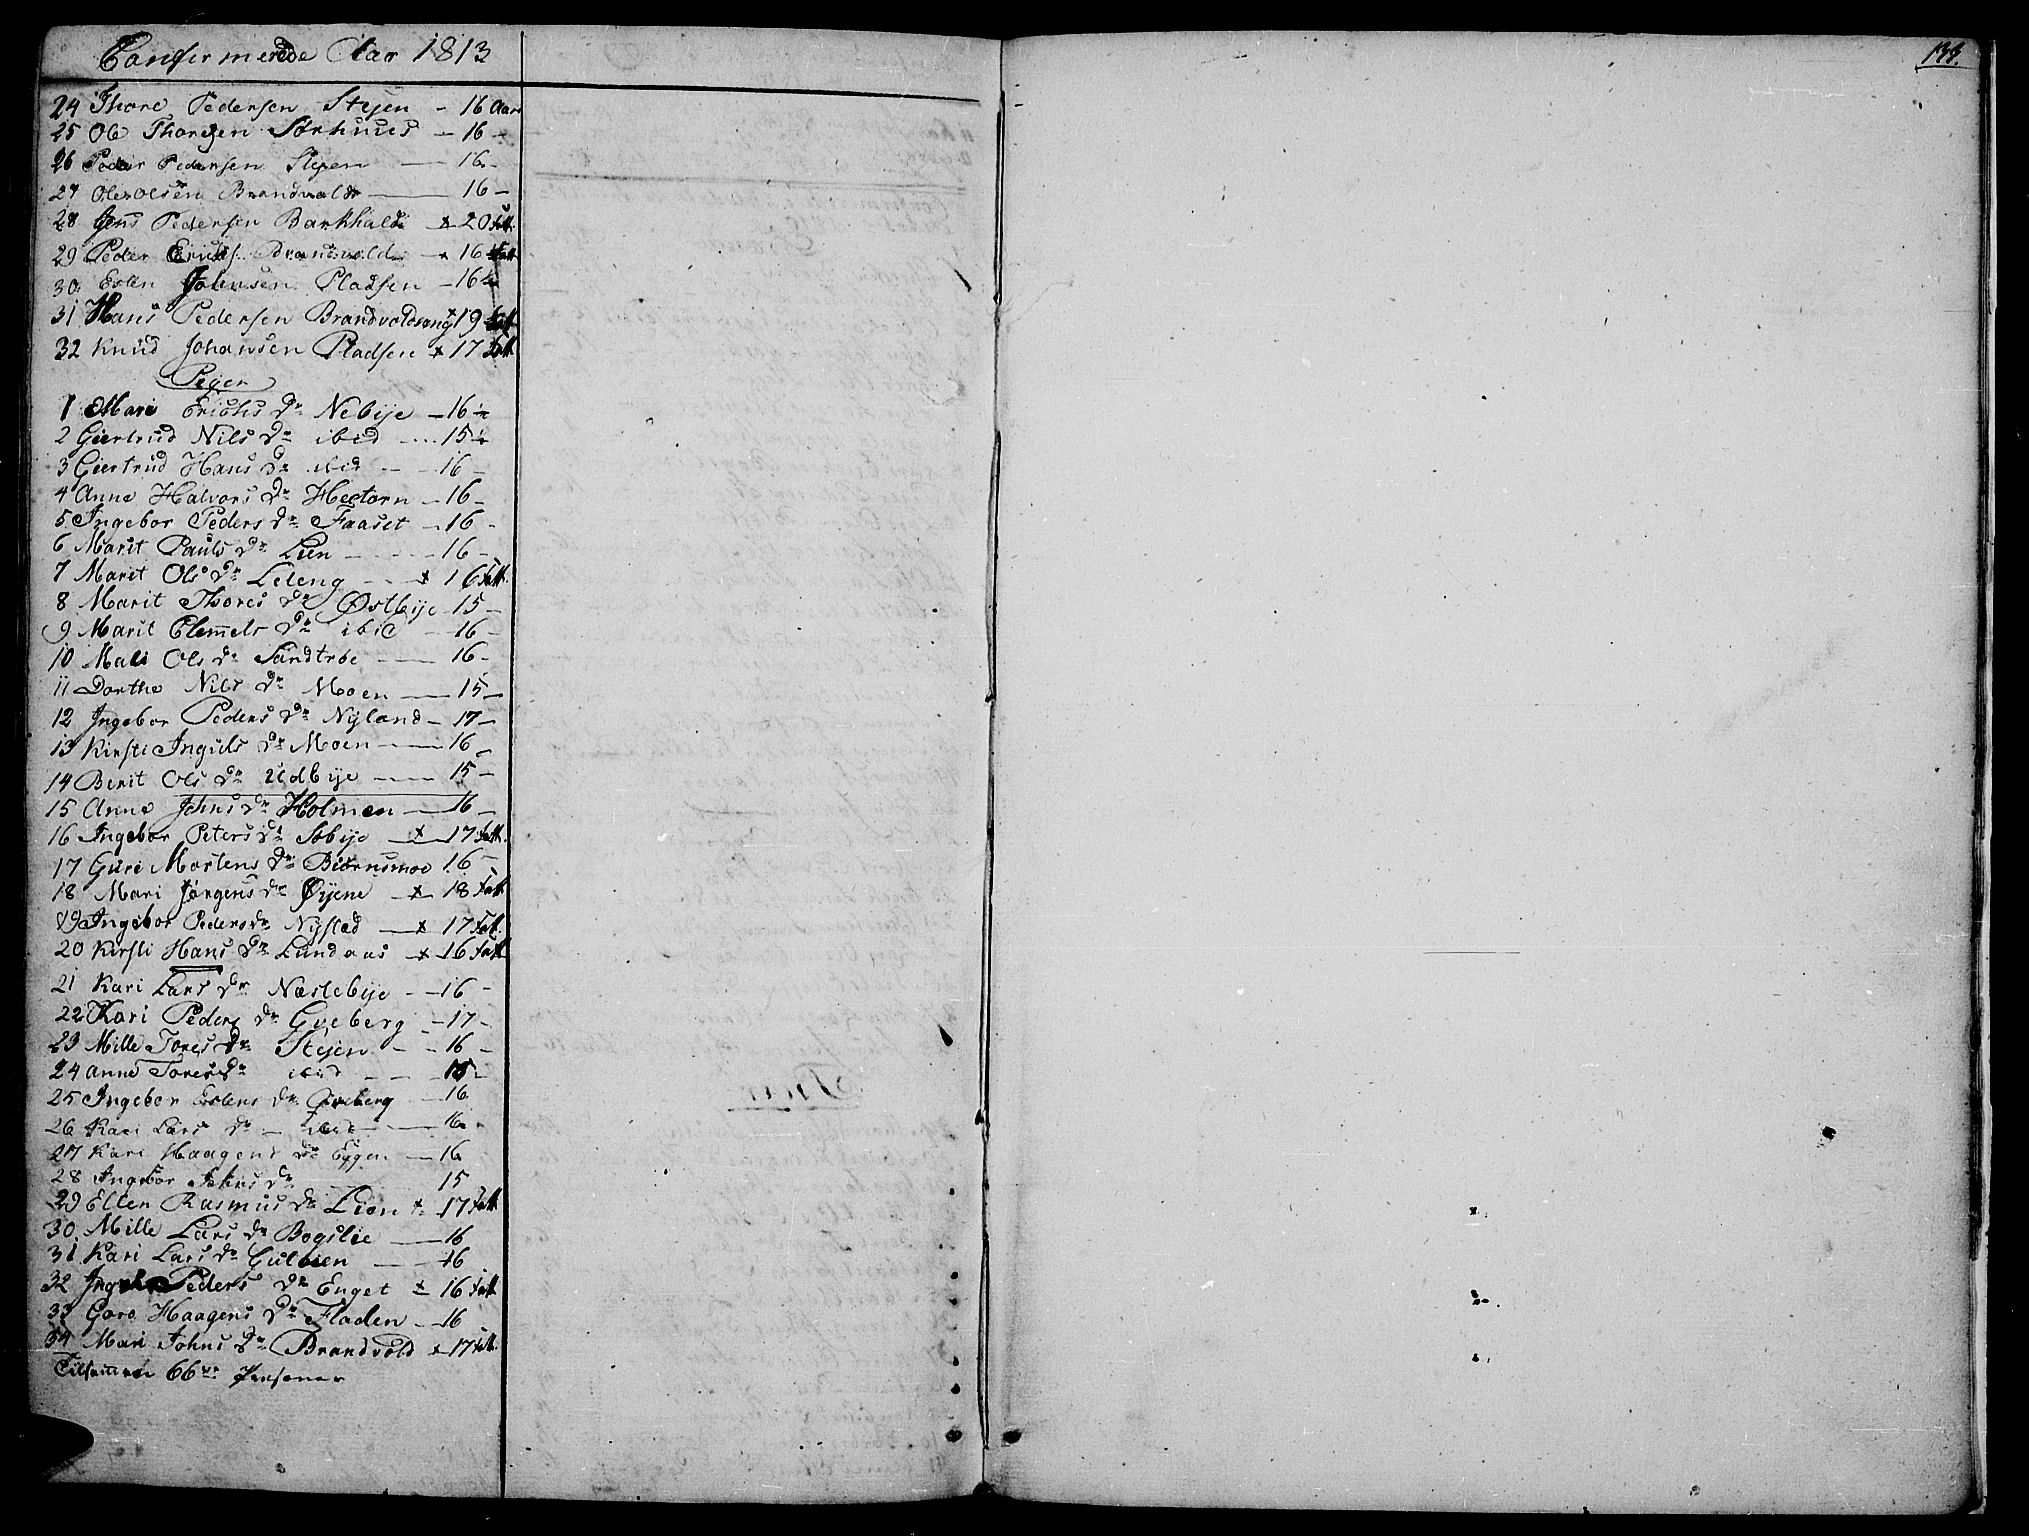 SAH, Tynset prestekontor, Ministerialbok nr. 16, 1801-1814, s. 133